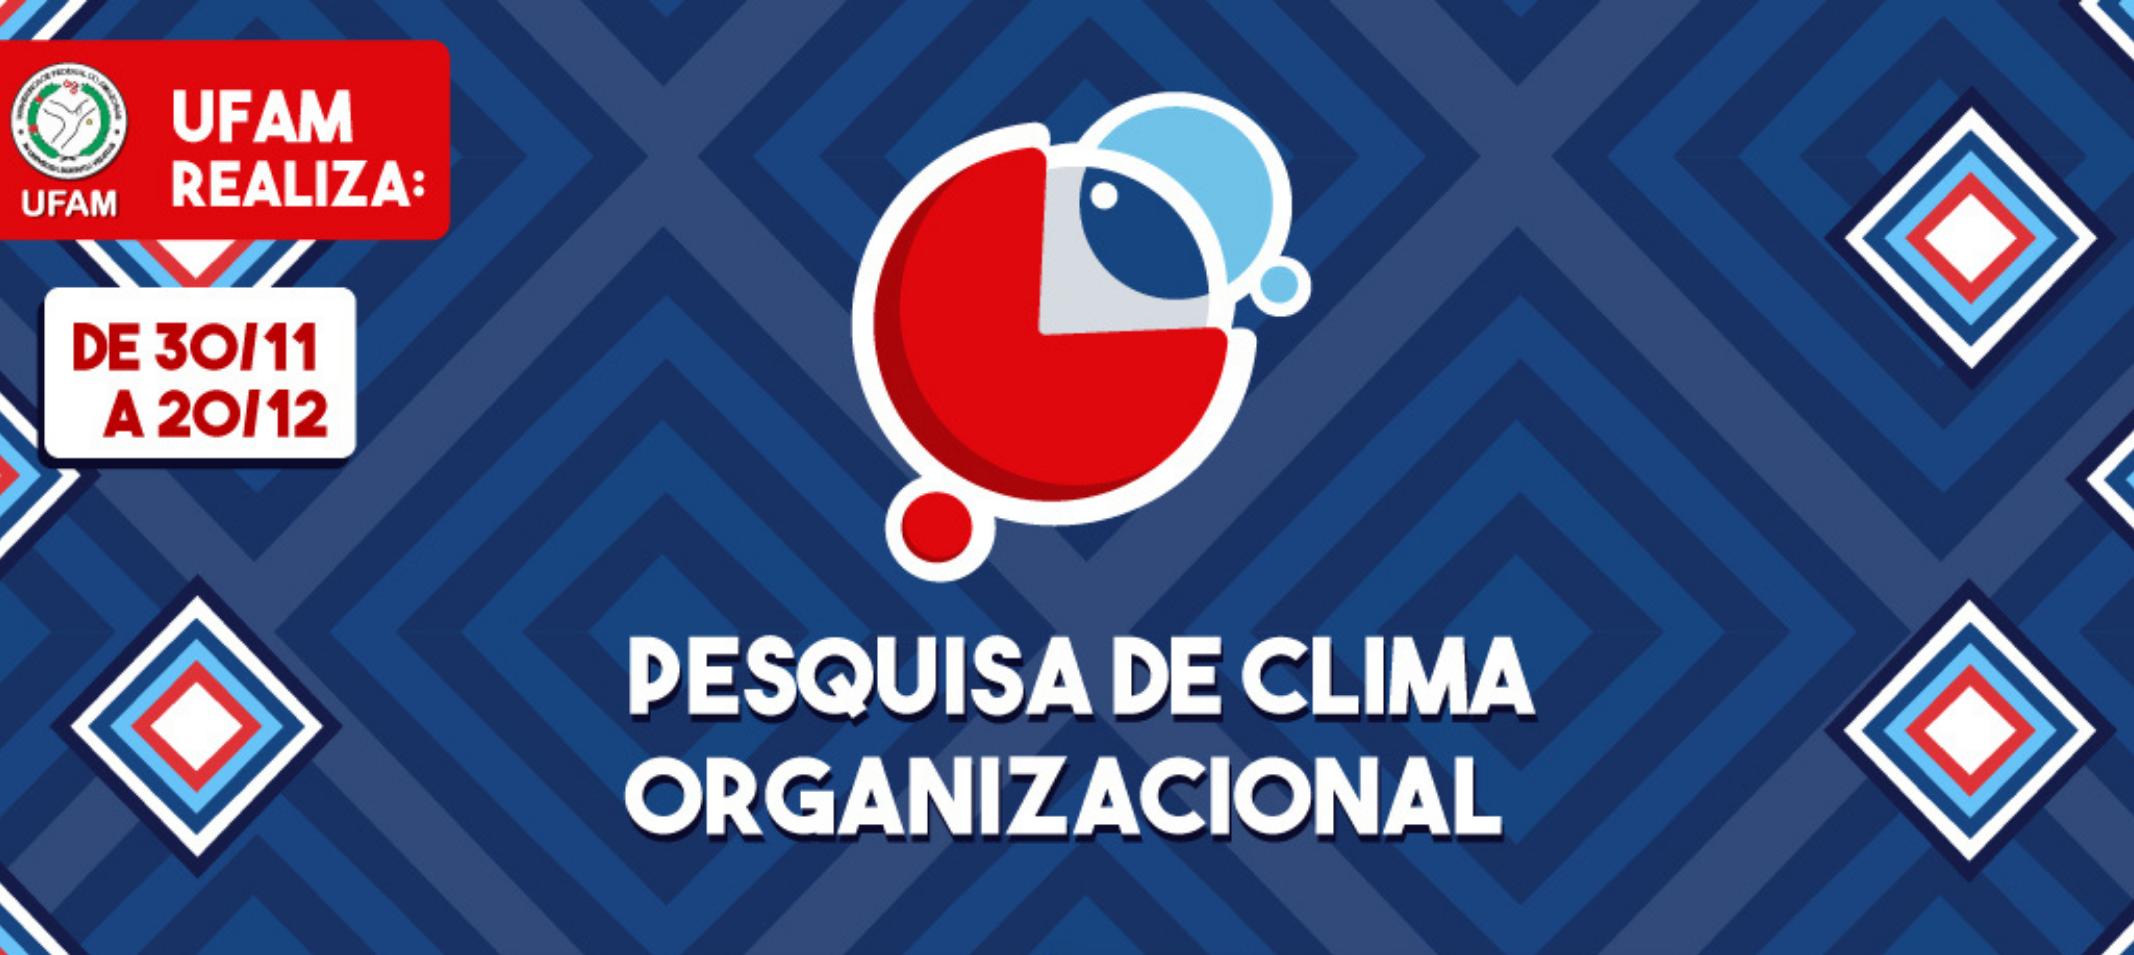 Ufam realiza Pesquisa de Clima Organizacional